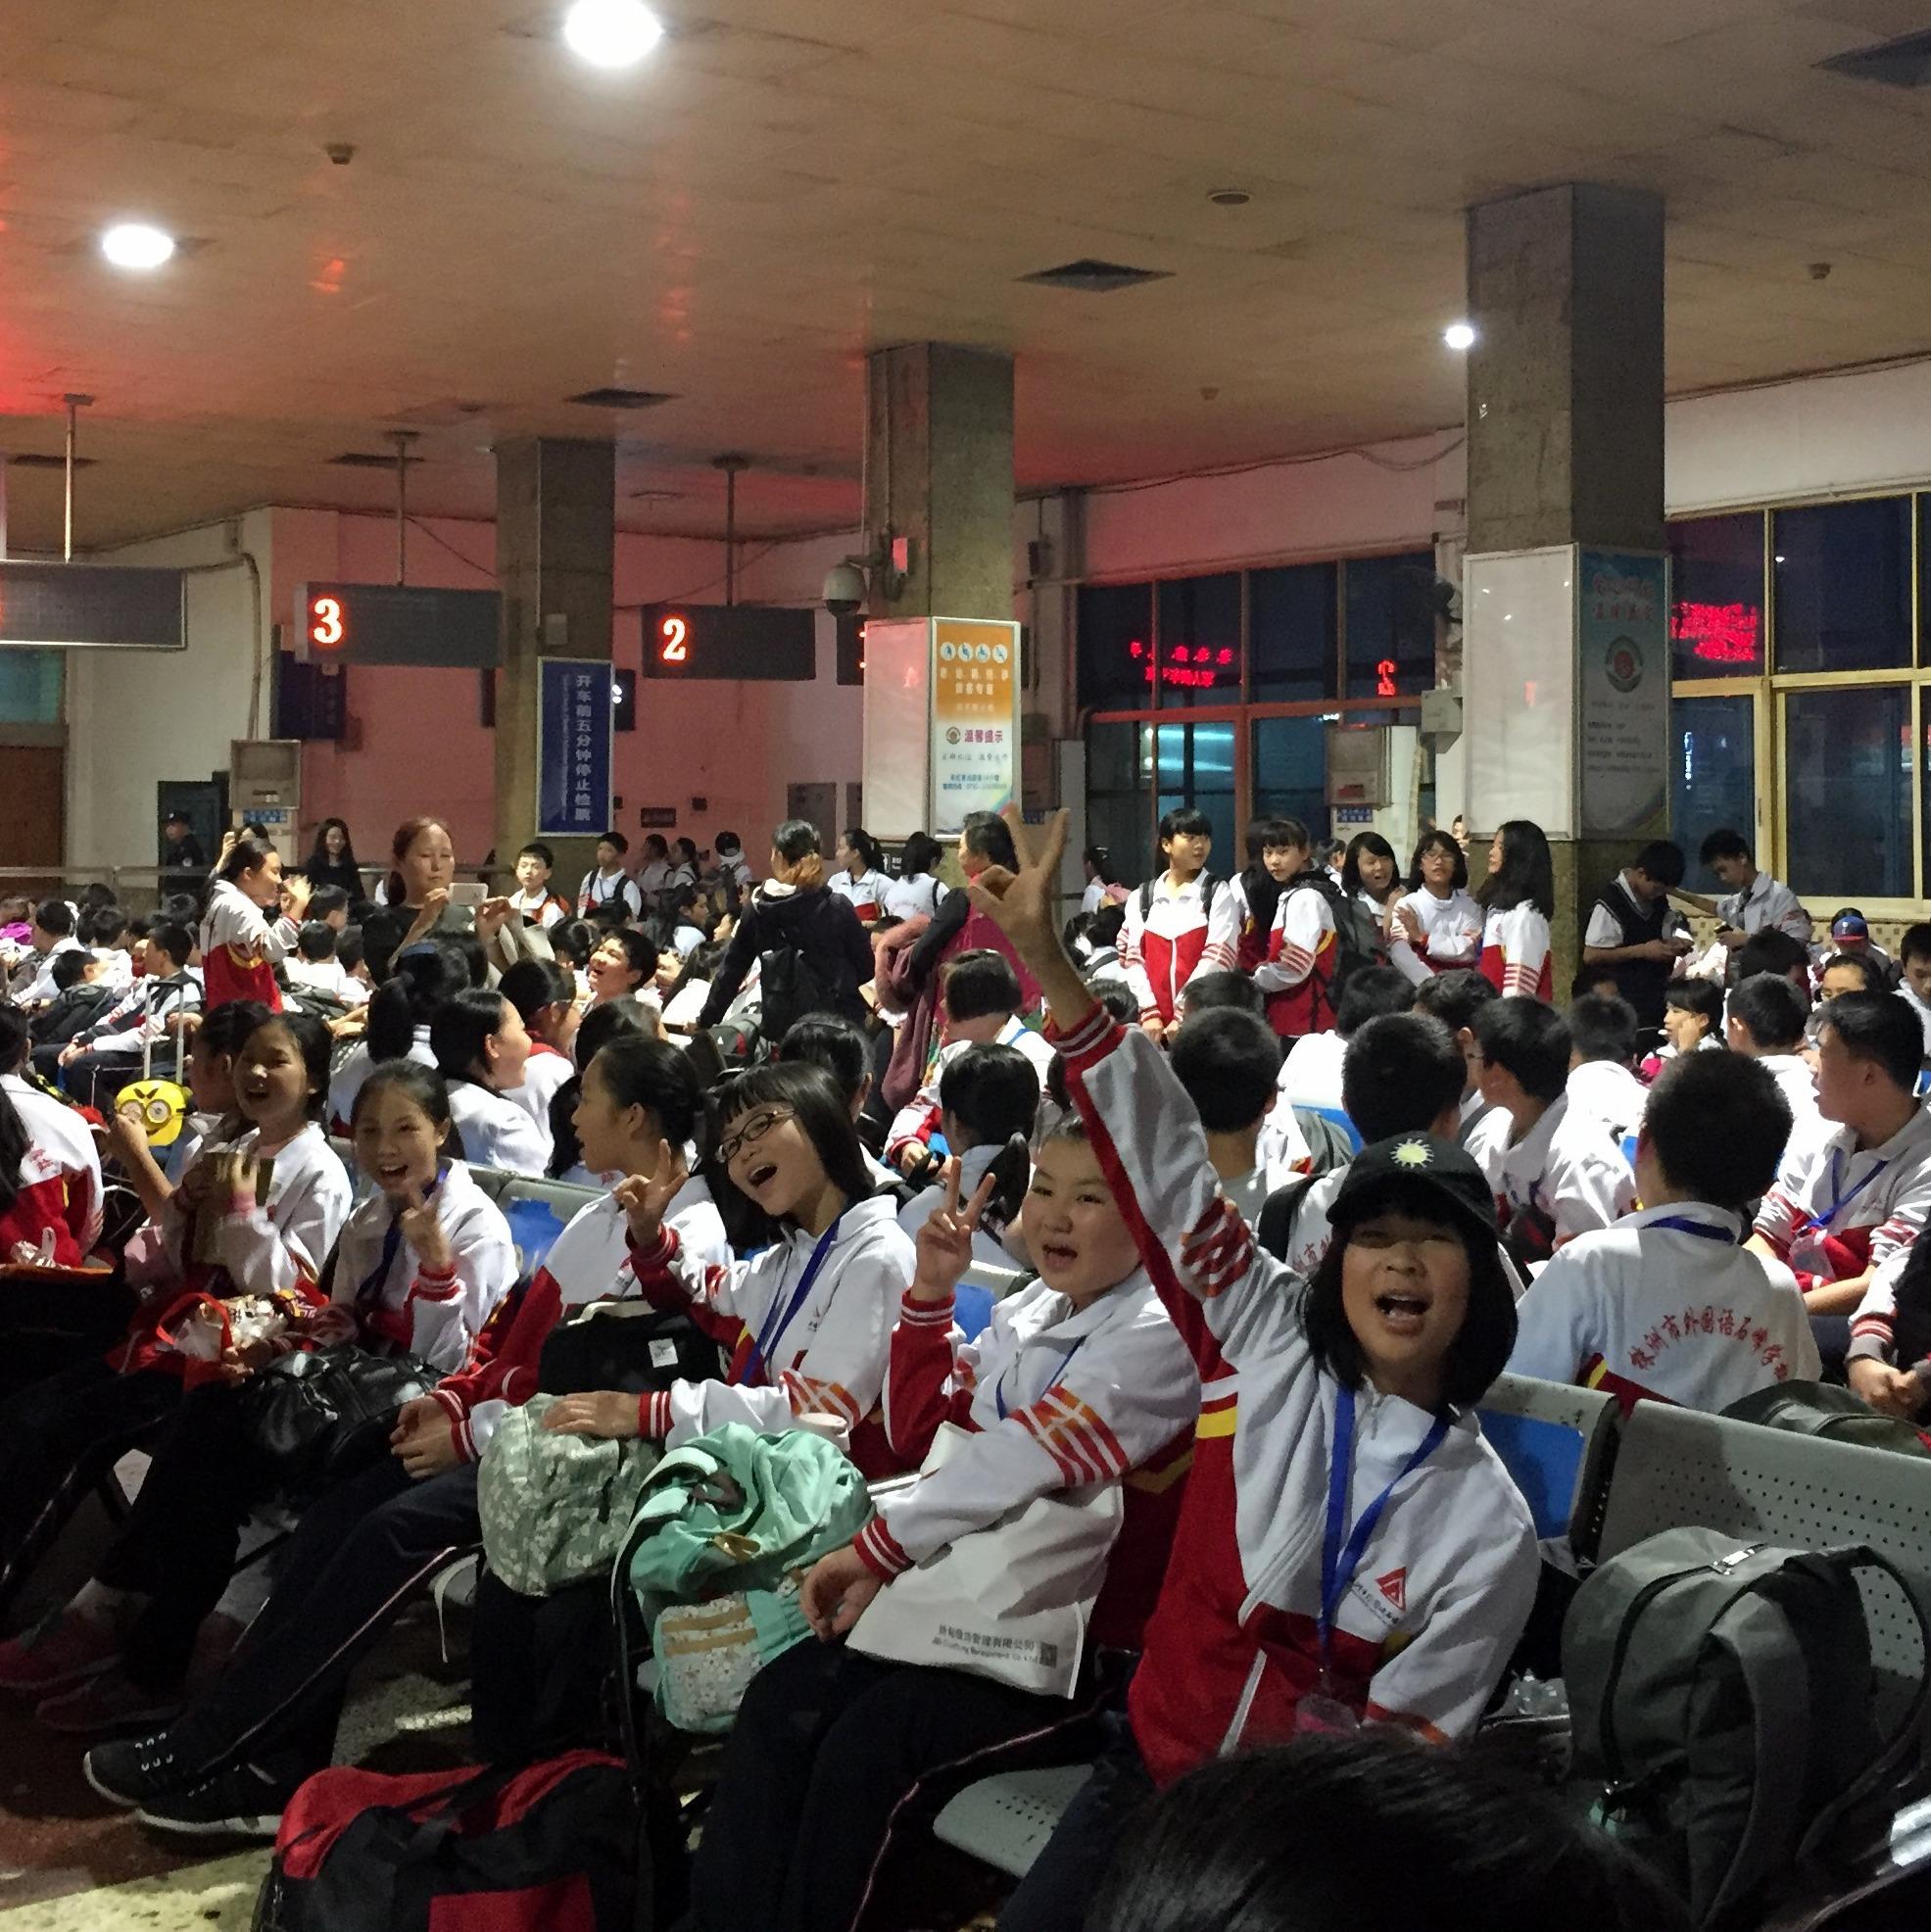 Ein Bahnhof voller Shifeng Schüler